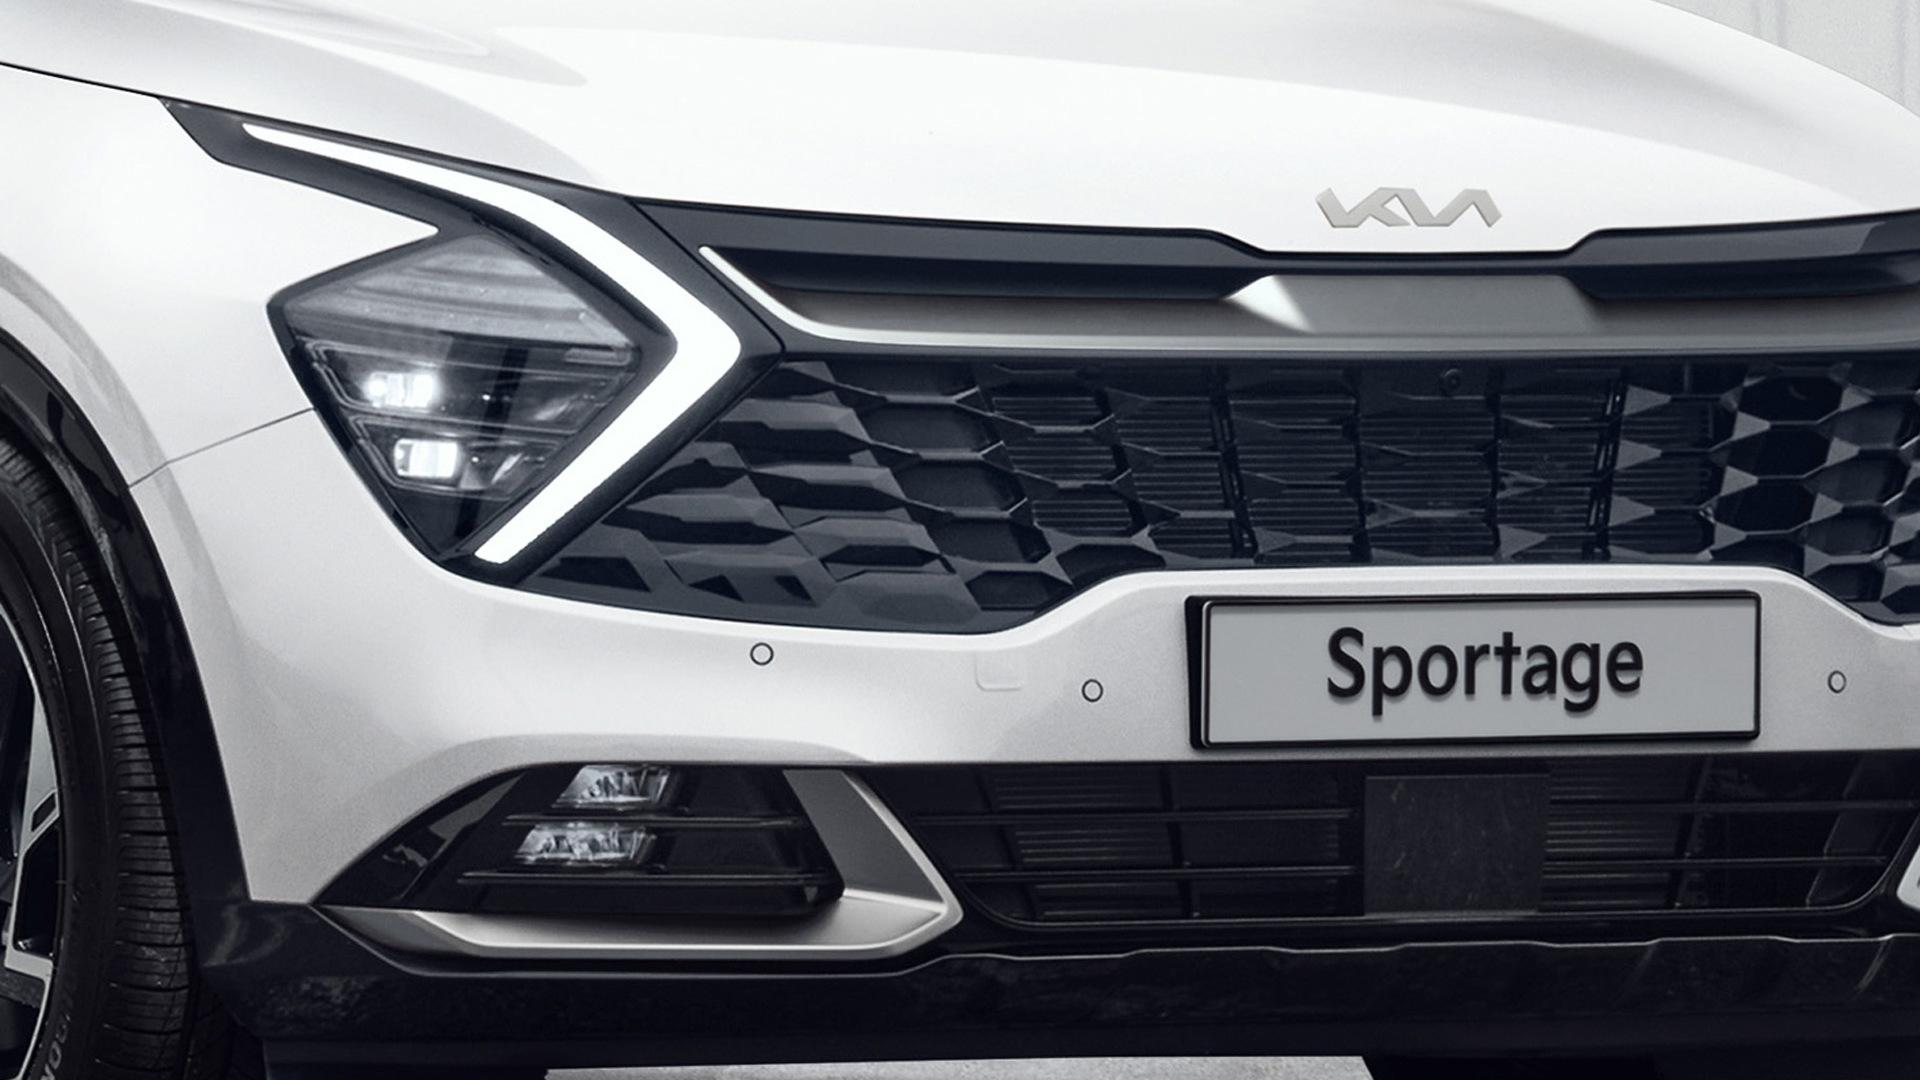 2023 Kia Sportage (European spec)